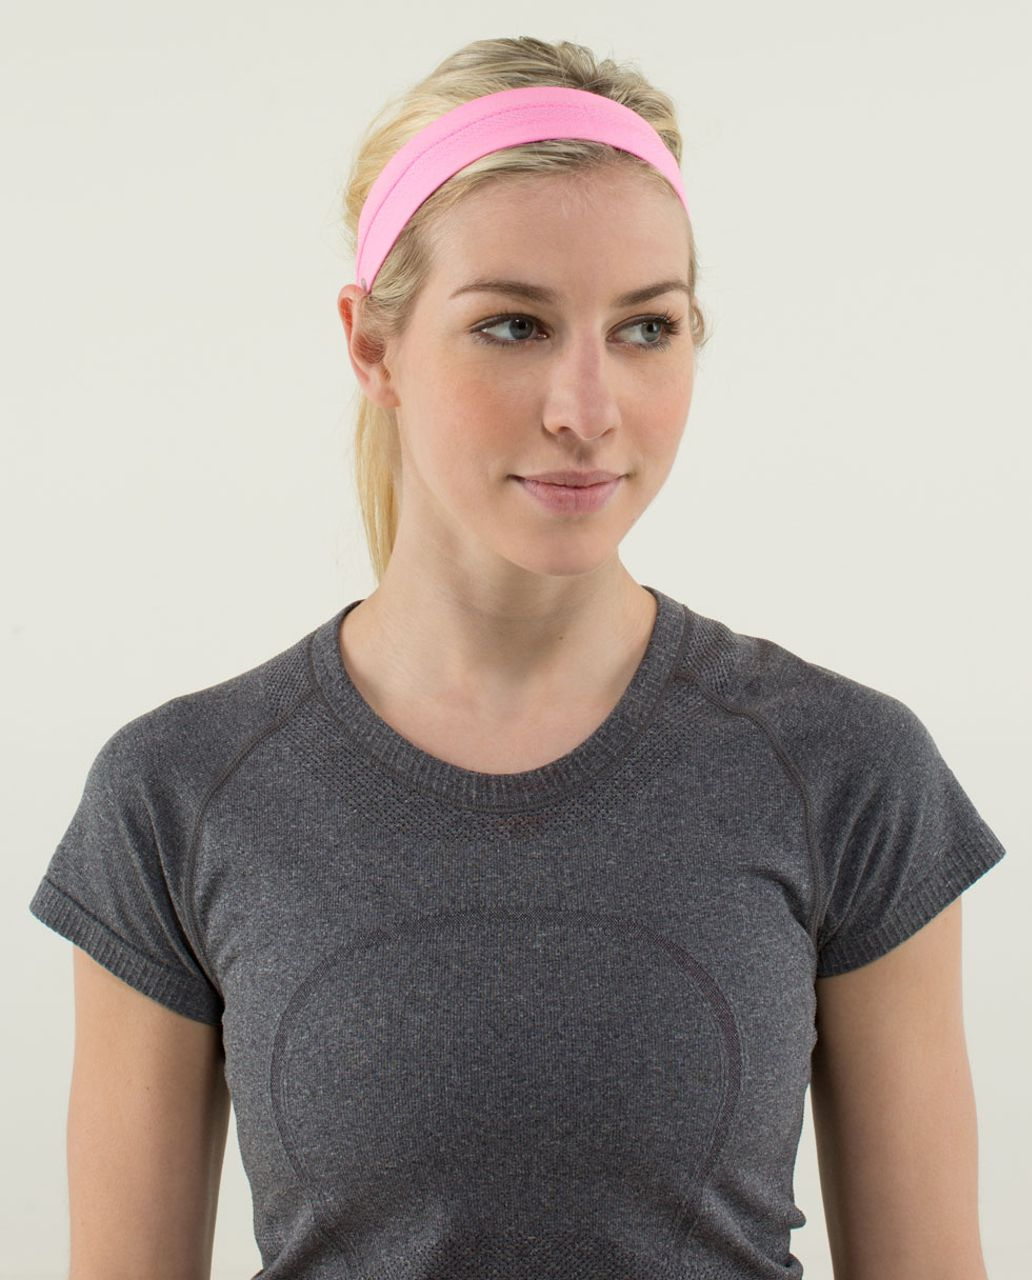 Lululemon Swiftly Headband - Heathered Zing Pink Light